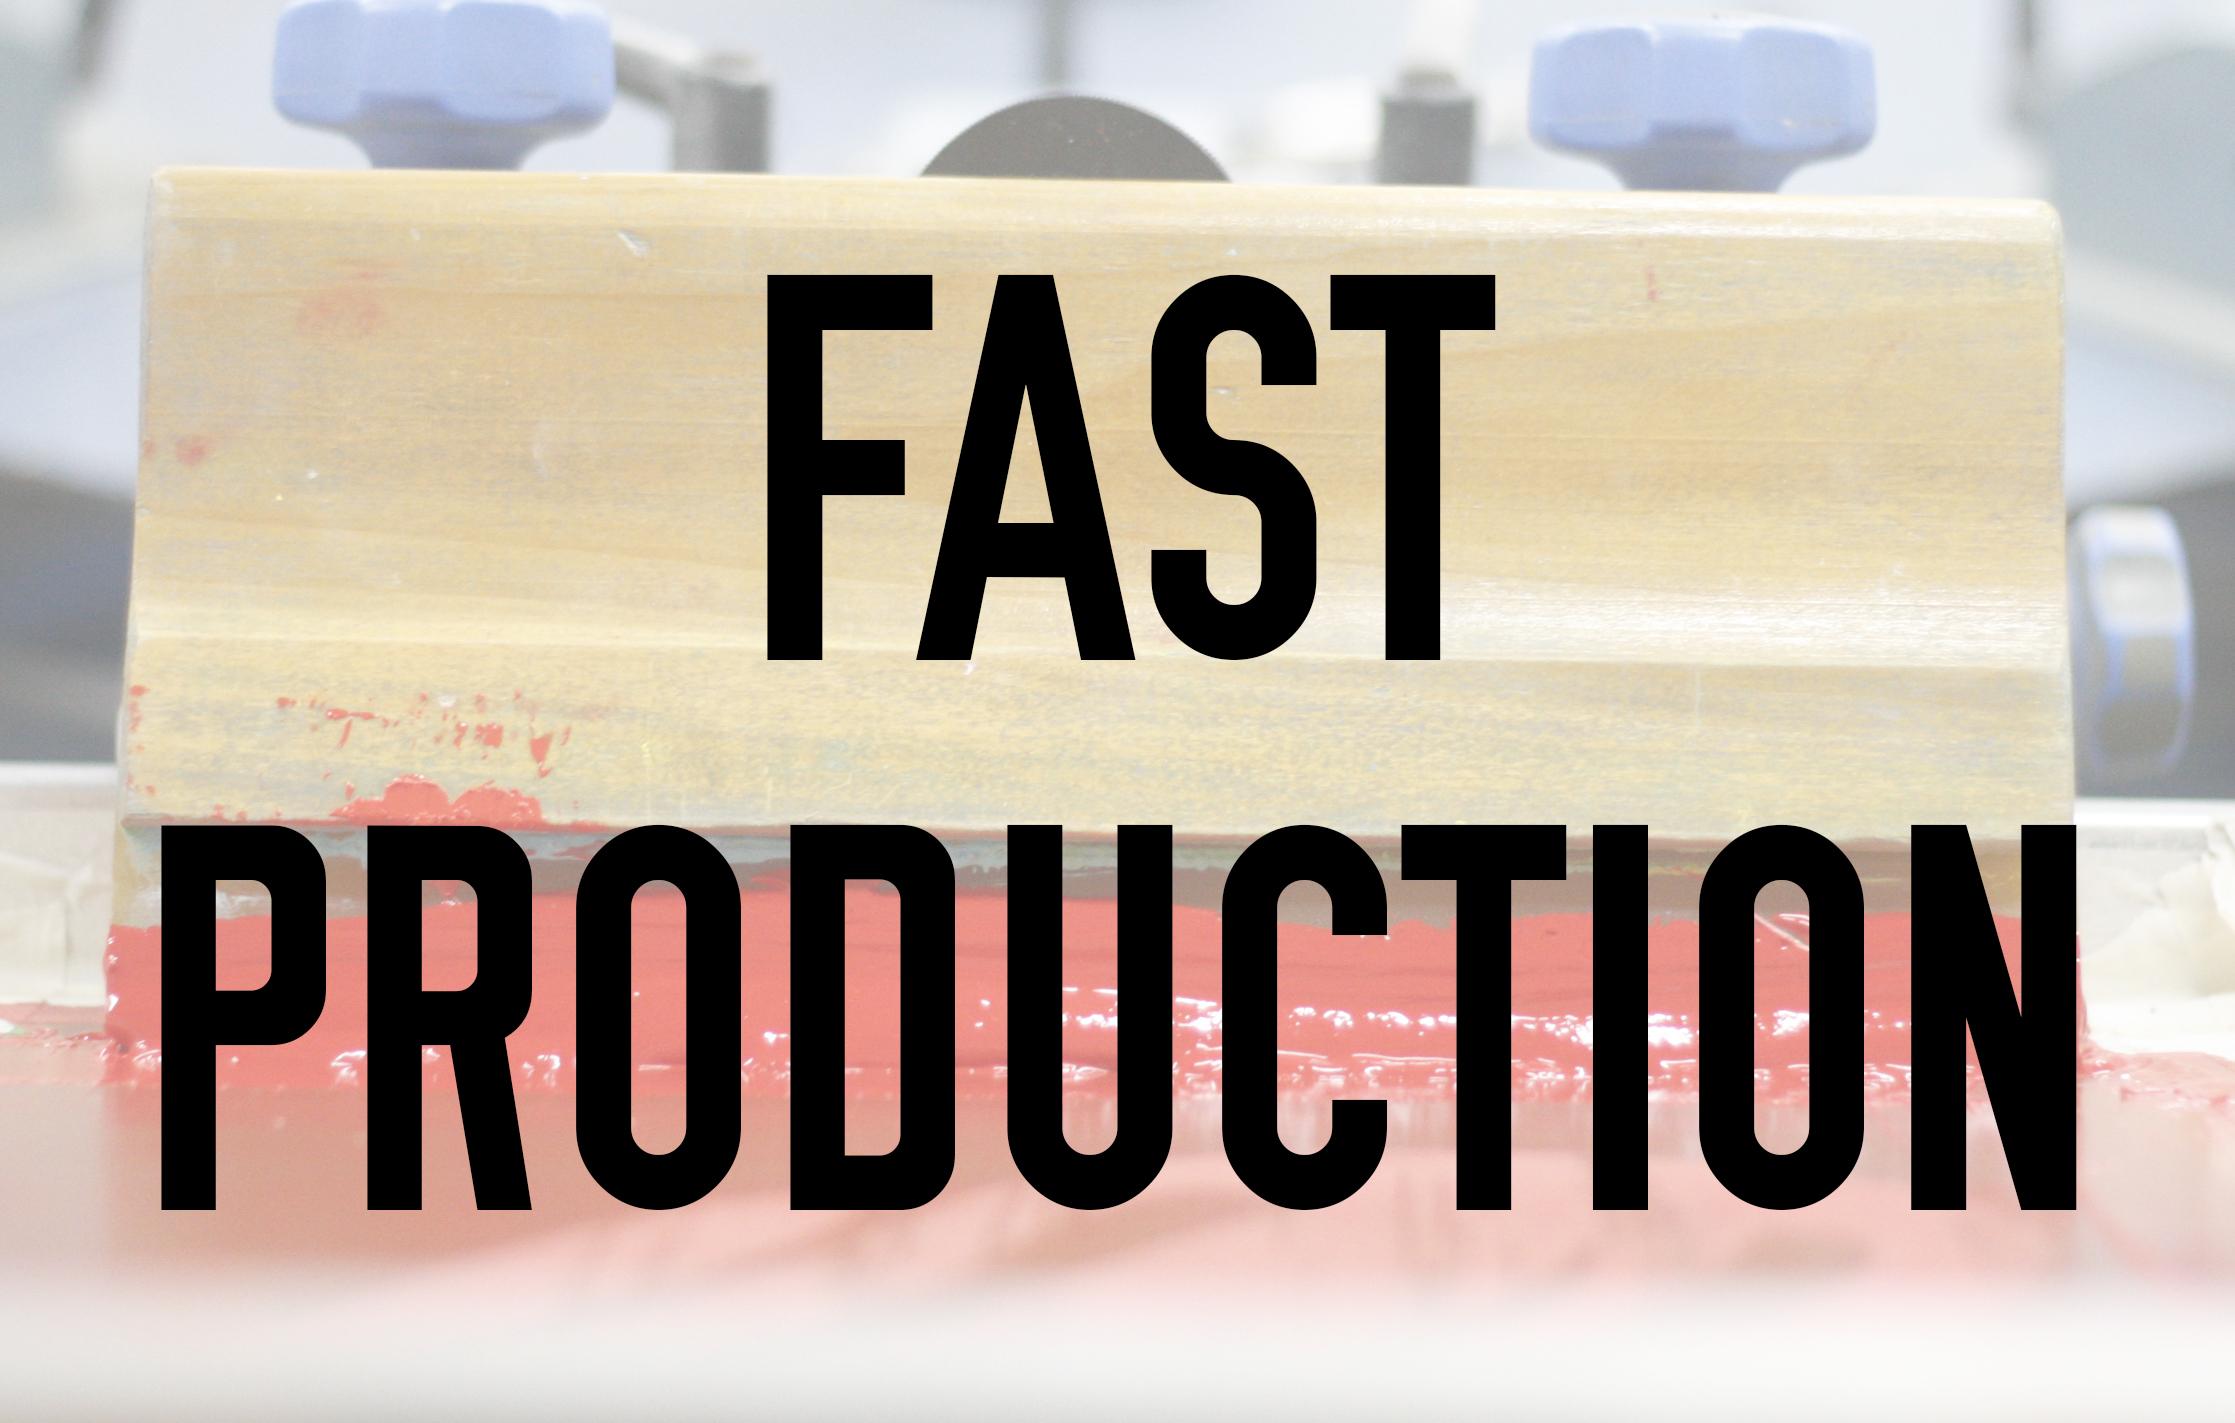 fastproduction.jpg